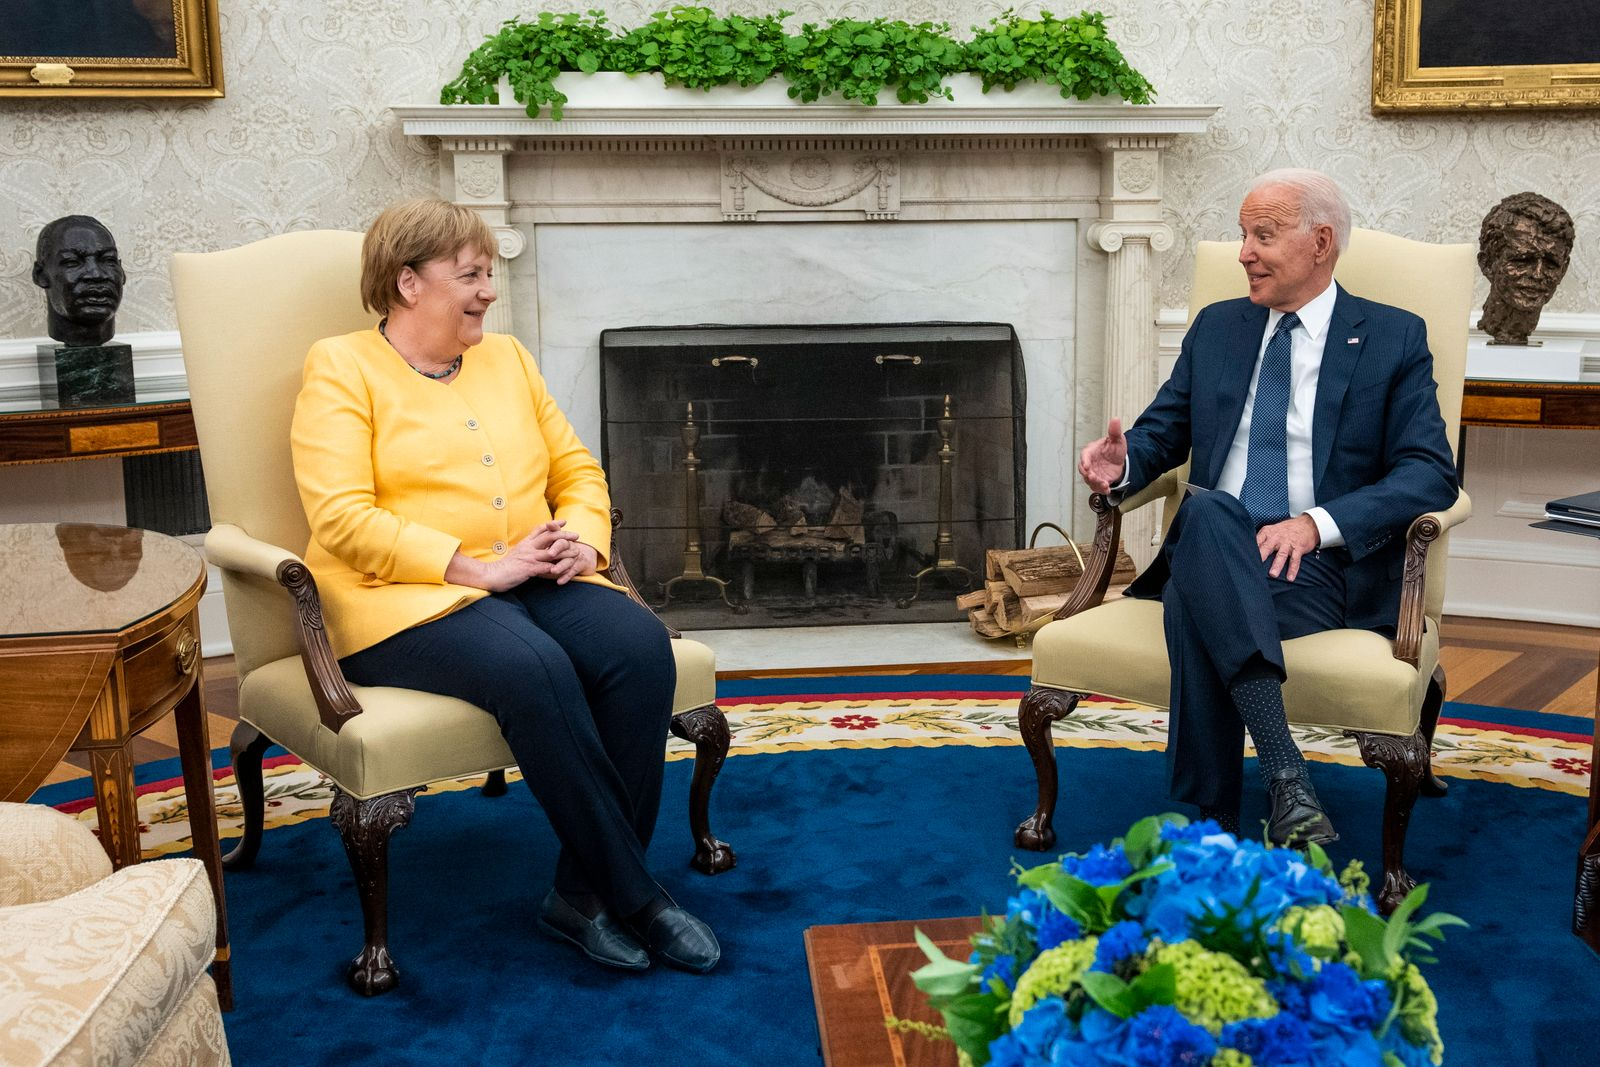 US President Joe Biden meets with German Chancellor Angela Merkel